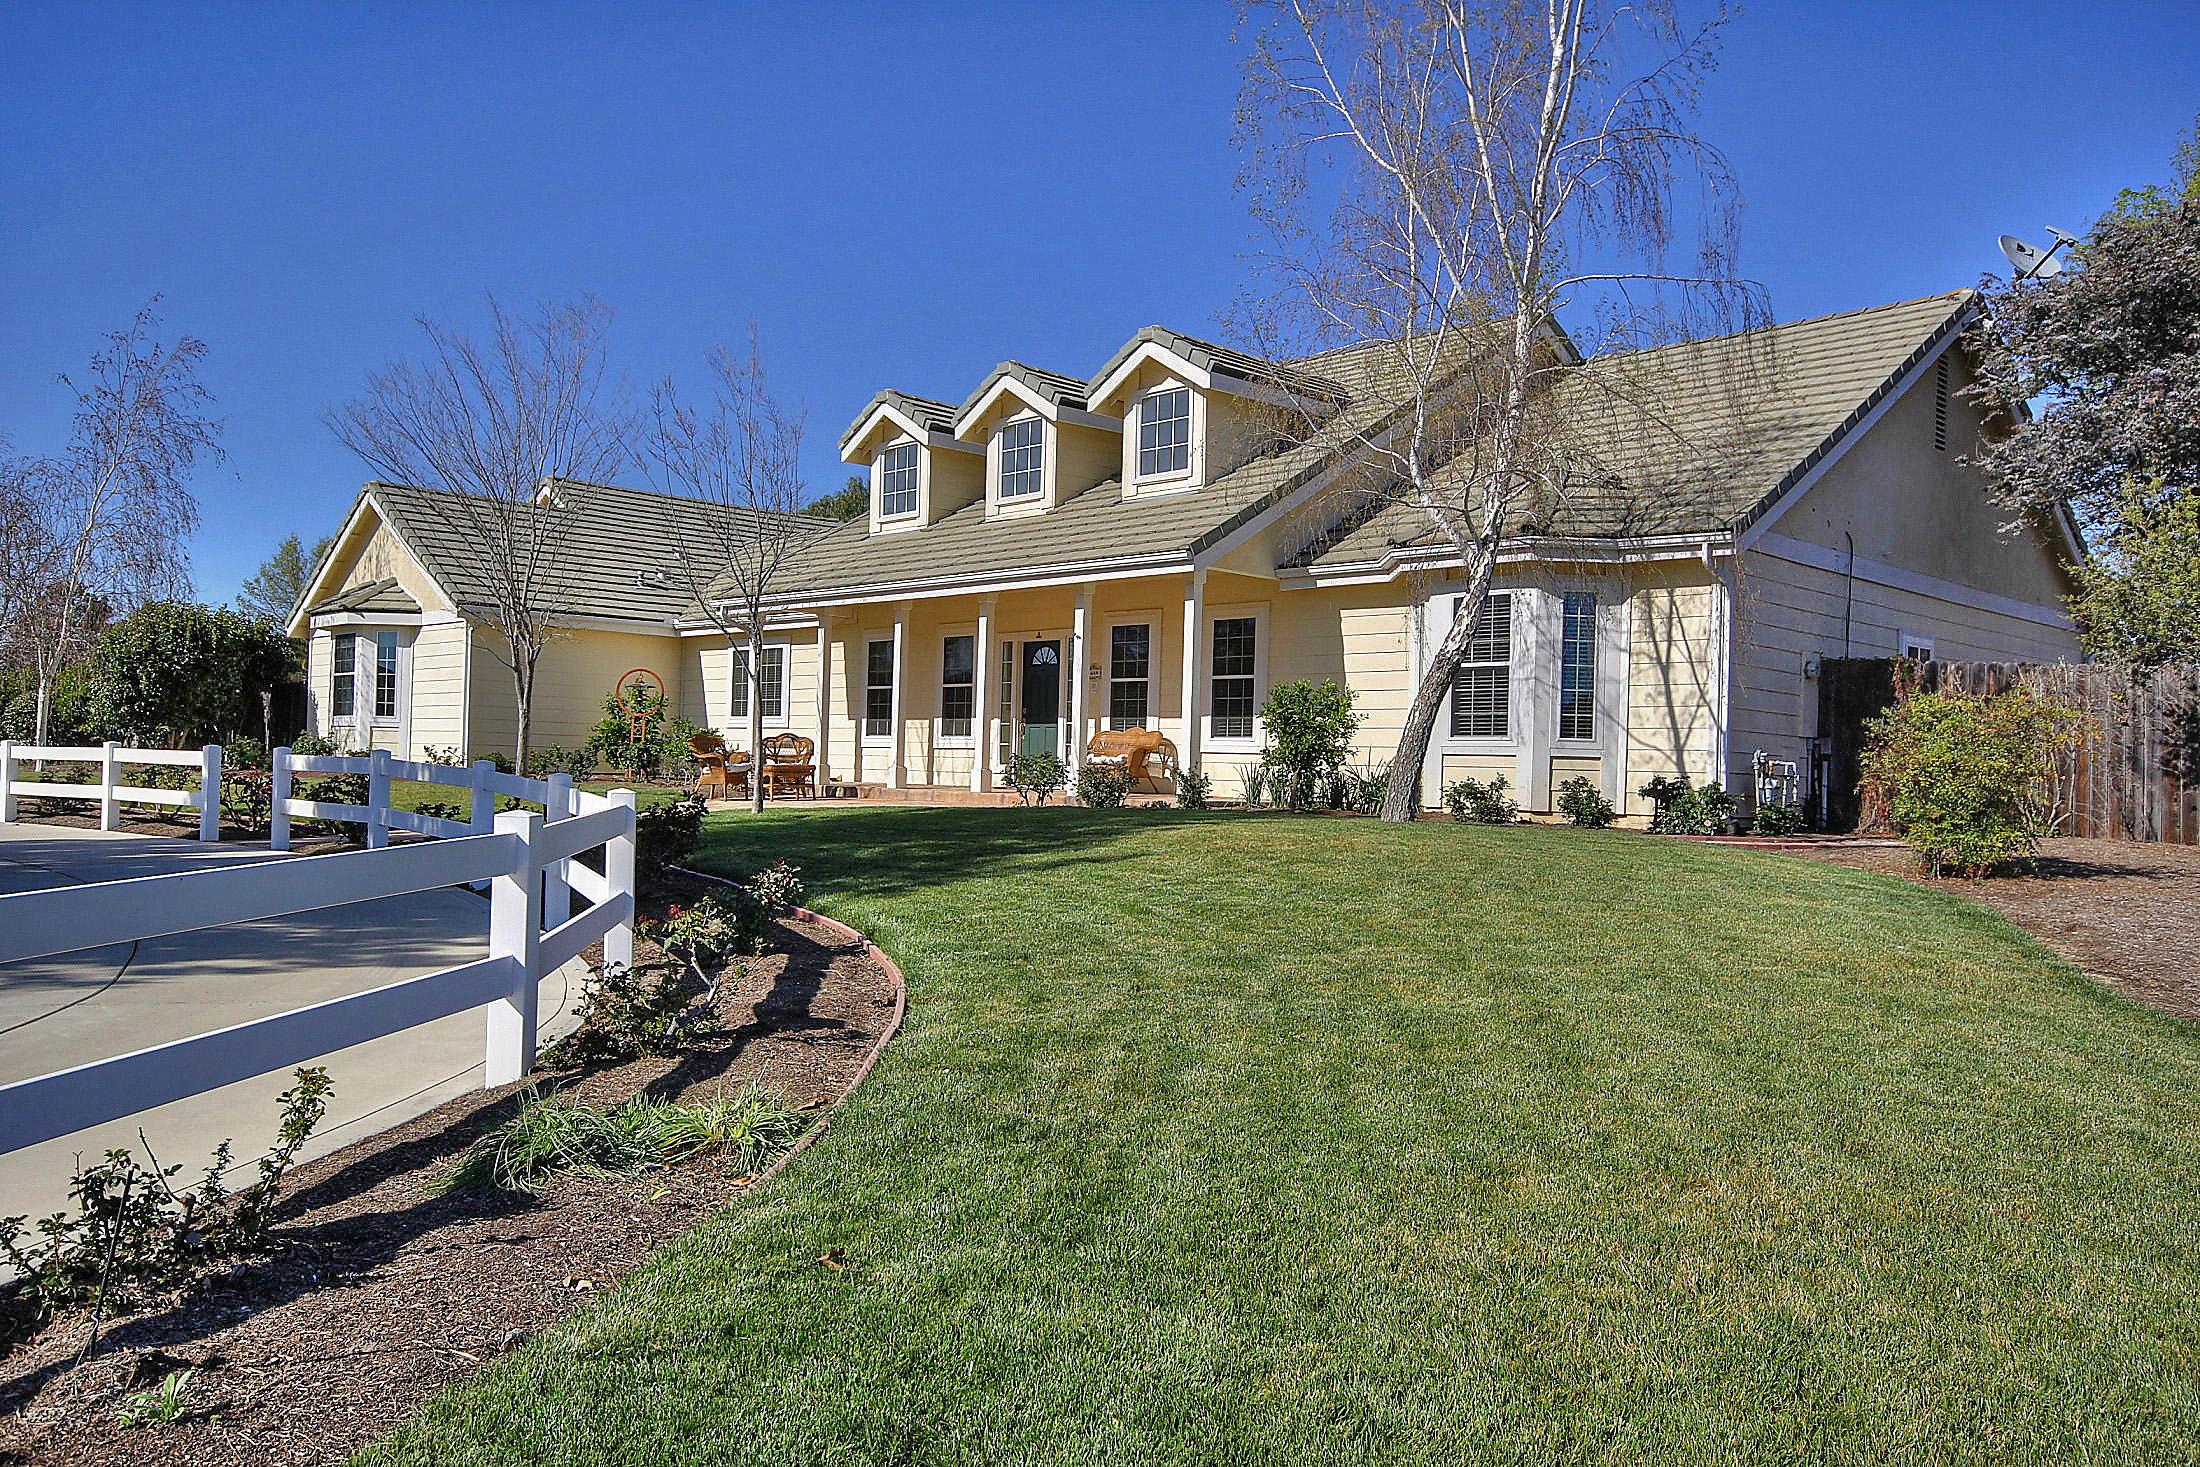 Property photo for 1448 Remington Dr Santa Ynez, California 93460 - 15-734